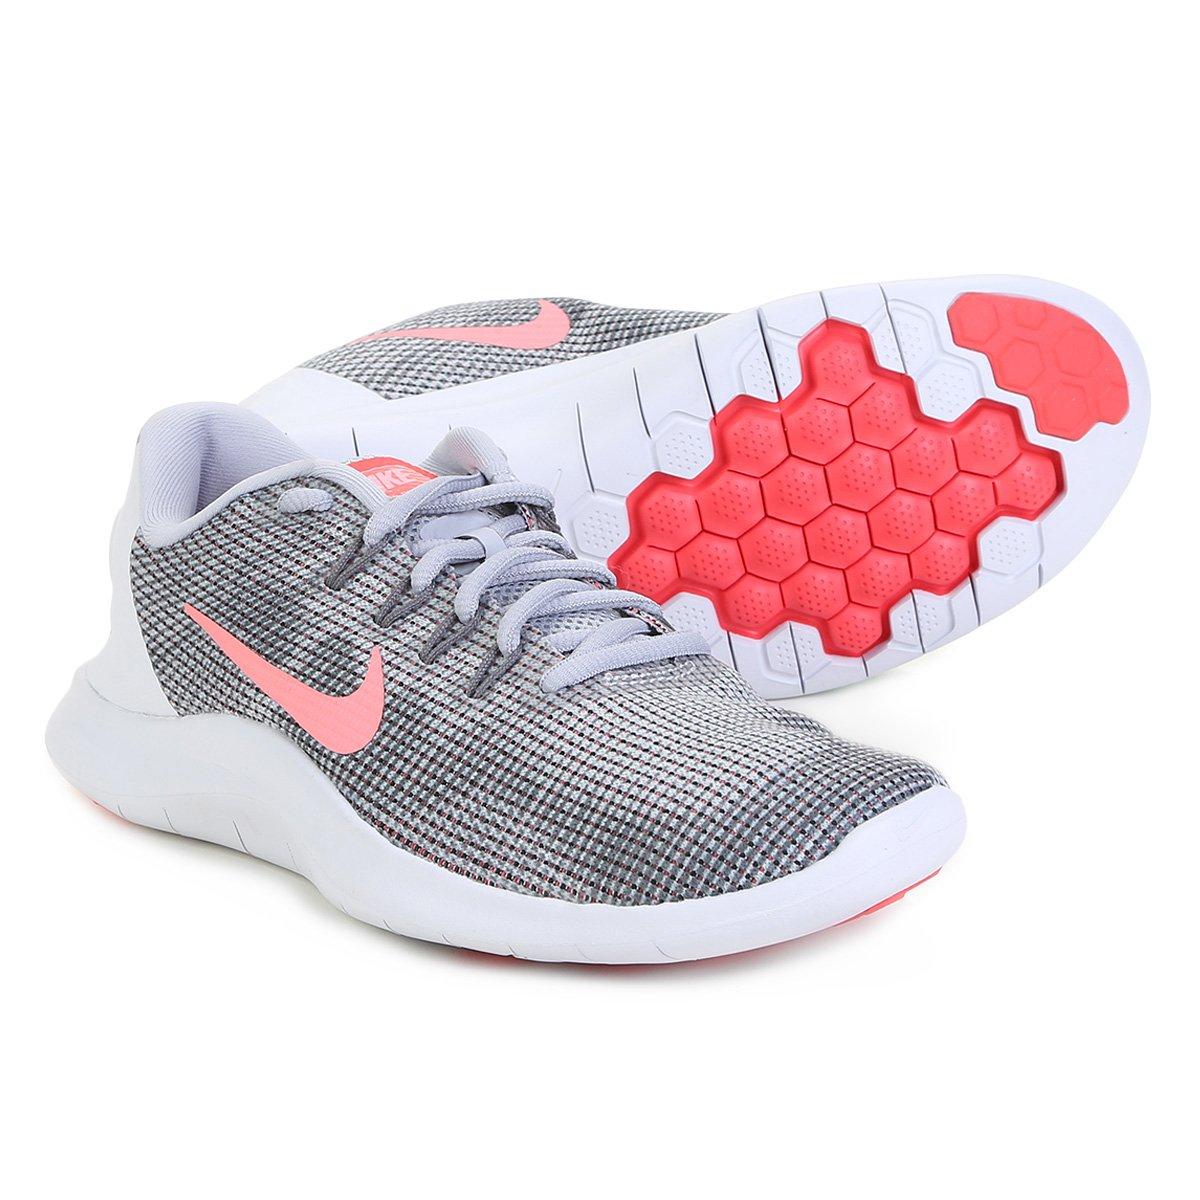 1d89217d83323 Tênis Nike Wmns Flex 2018 Rn Feminino - Cinza - Compre Agora